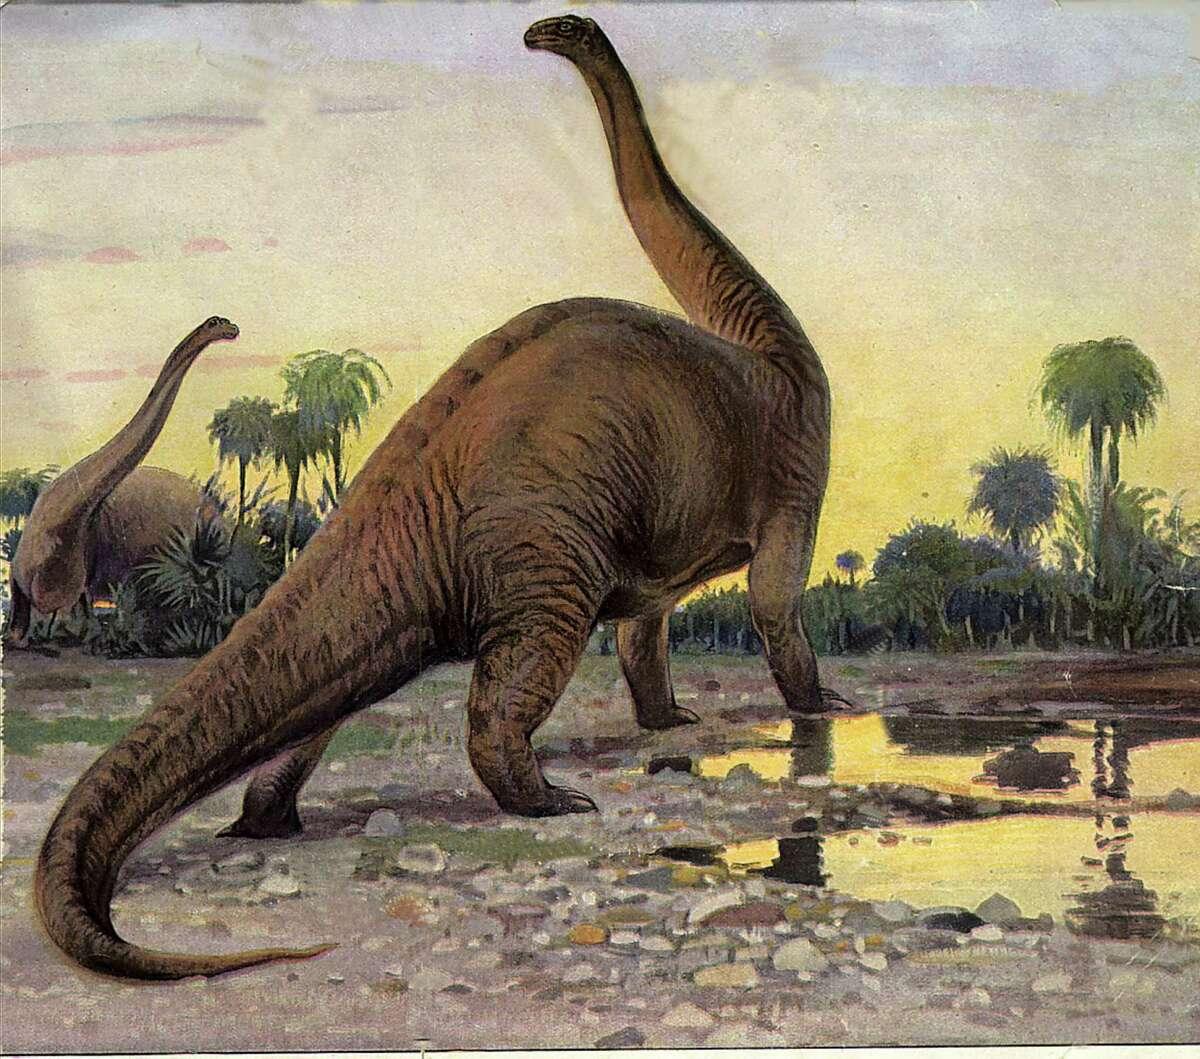 Drawing of the late Jurassic dinosaur, the Brontosaurus.